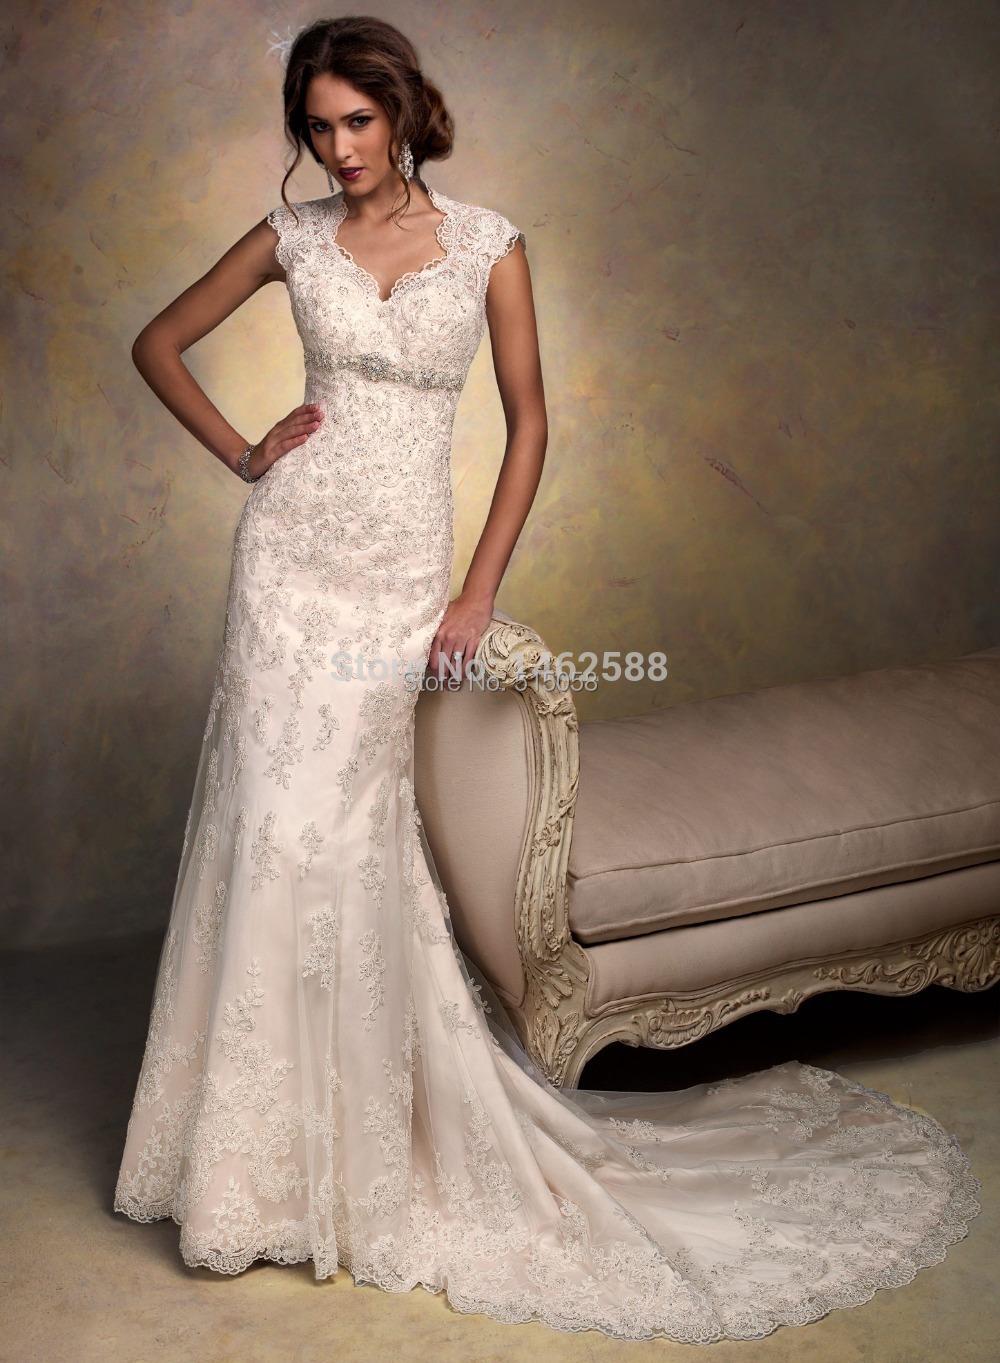 georgia gown wedding dress sale Ivory Georgia Gown BHLDN